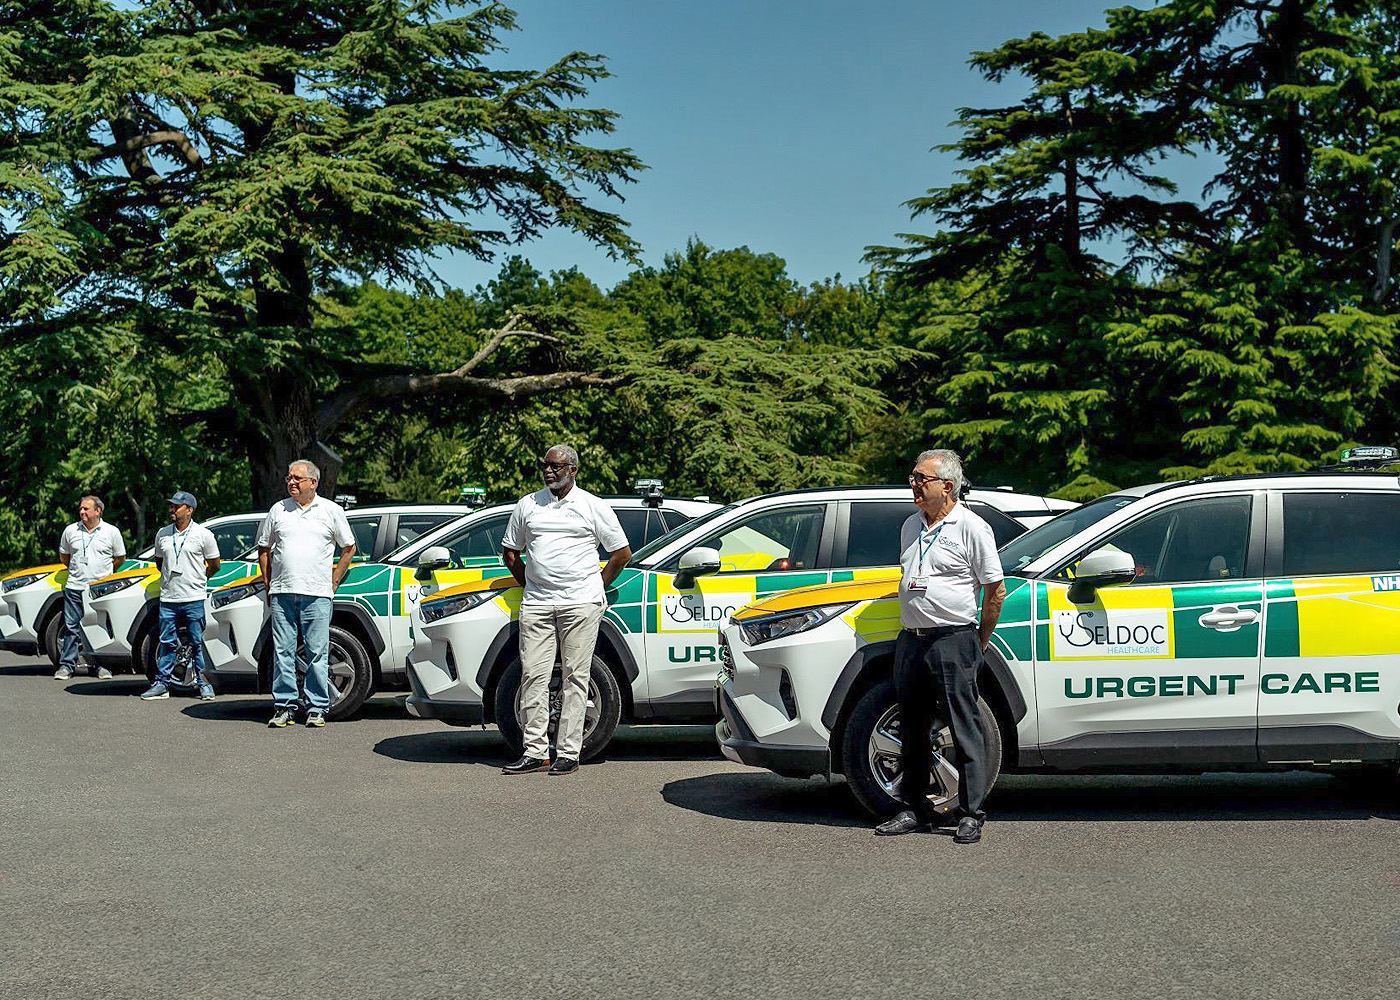 SELDOC Healthcare goes green with Fleet Alliance and Toyota RAV4s